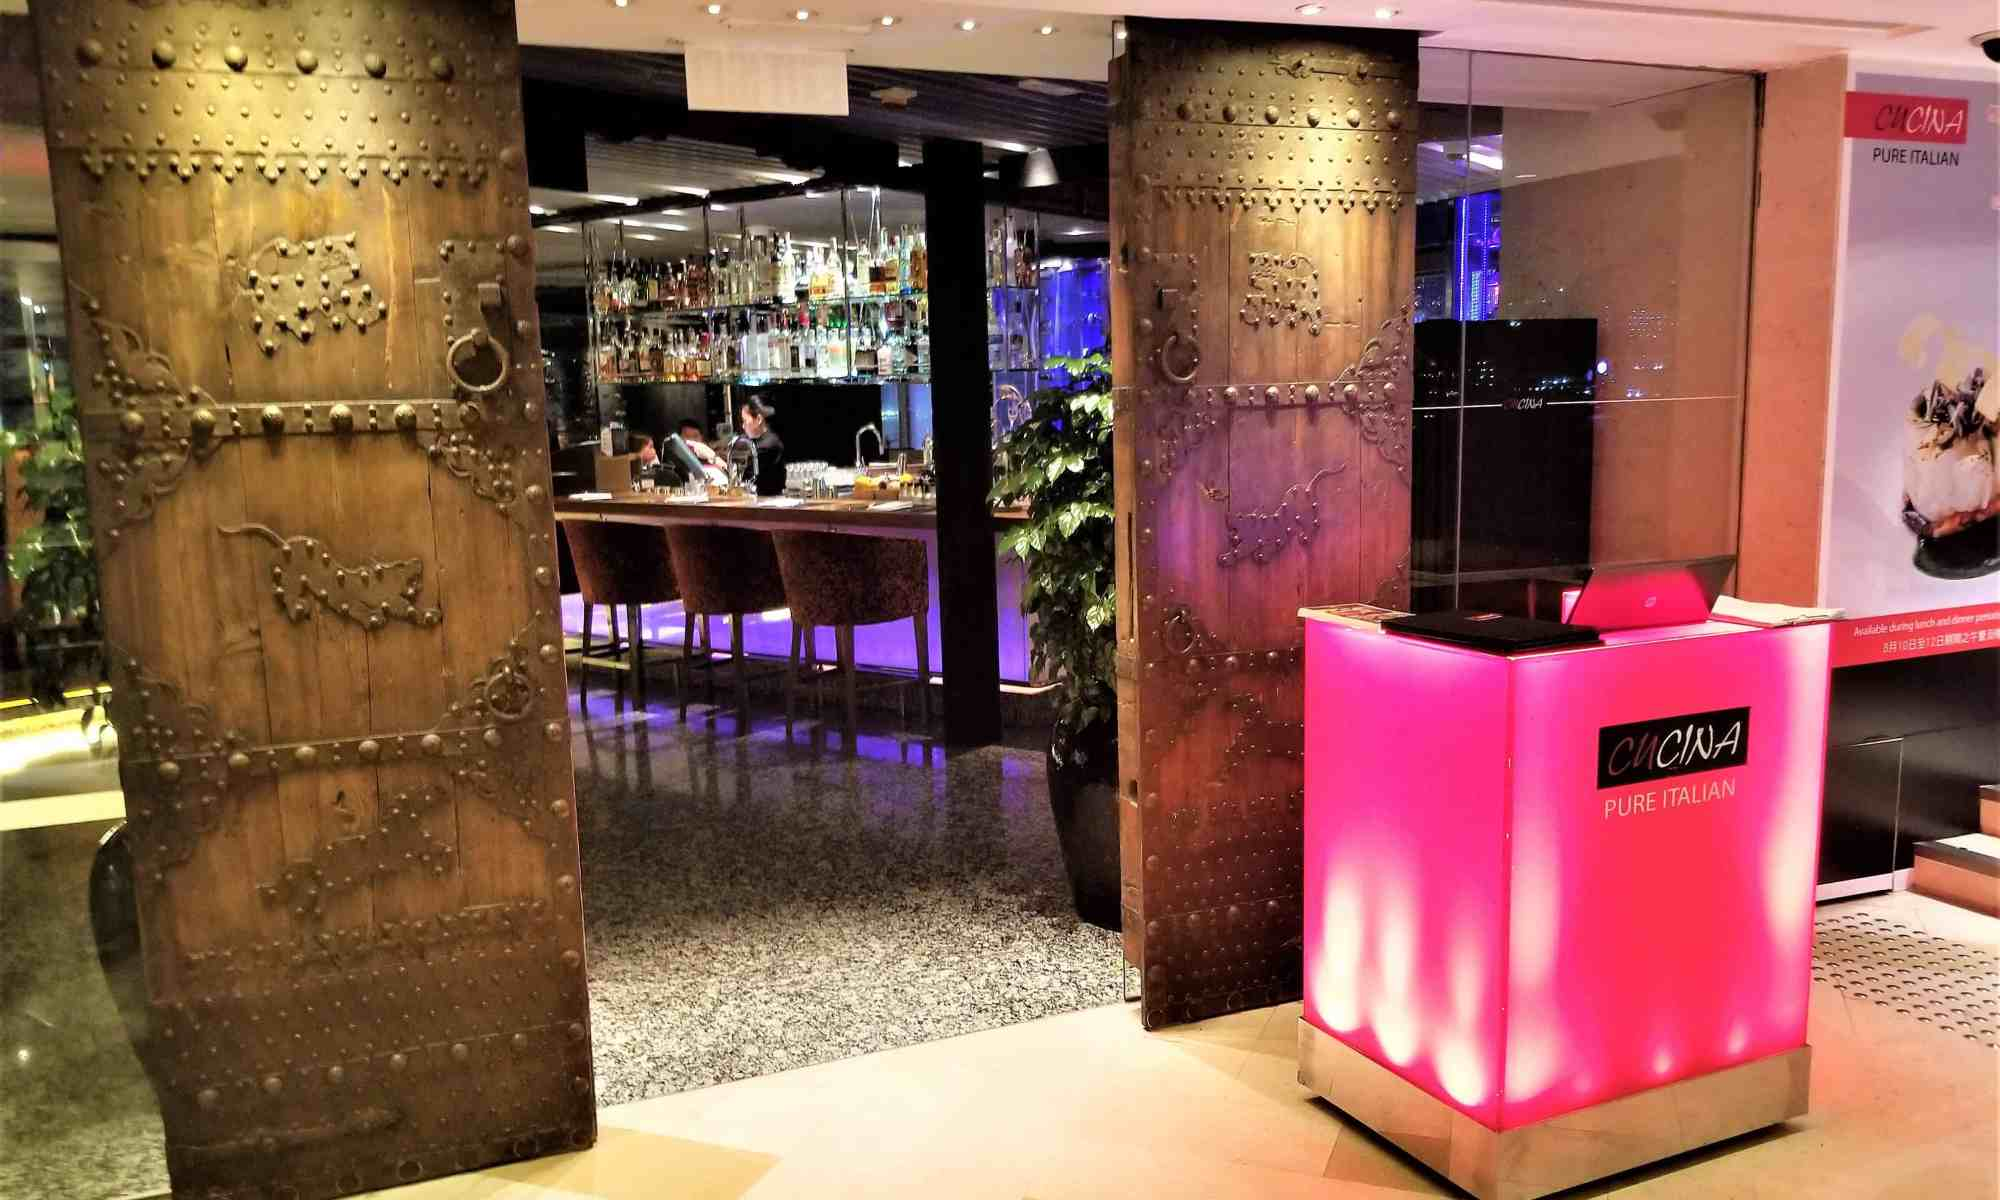 image-of-cucina-fine-dining-italtian-restaurant-marco-polo-hongkong-hotel